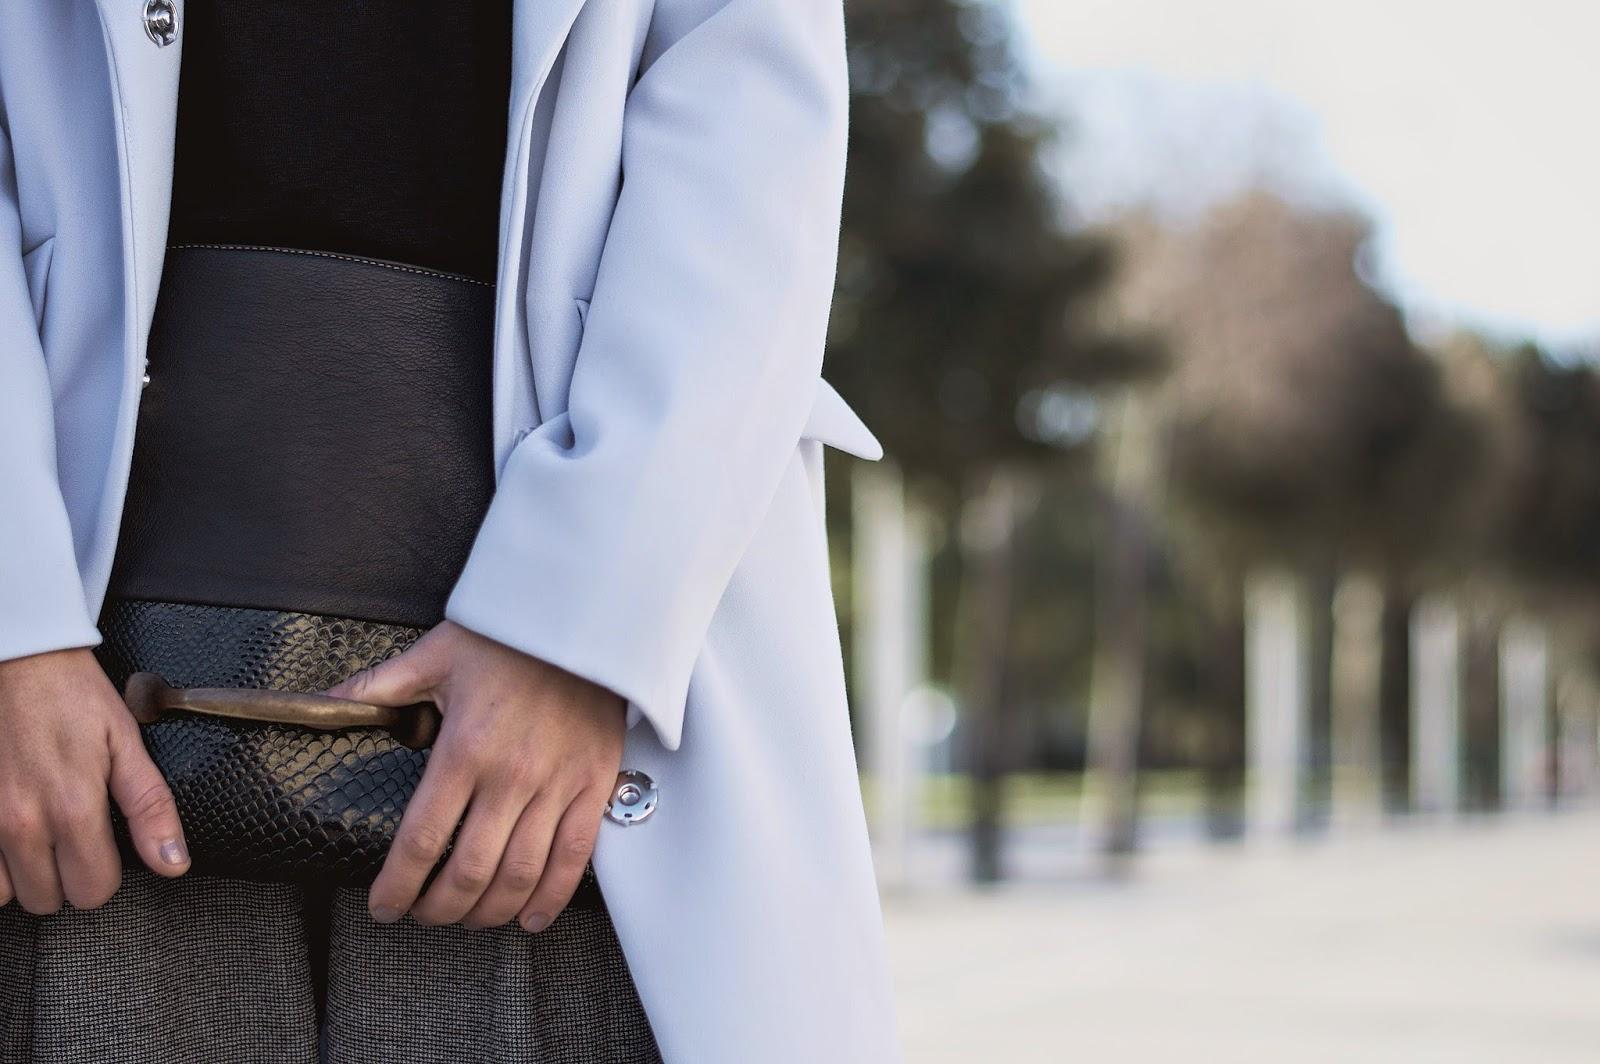 abrigo y pantalones H&M, clutch Malices, zapatos Geox